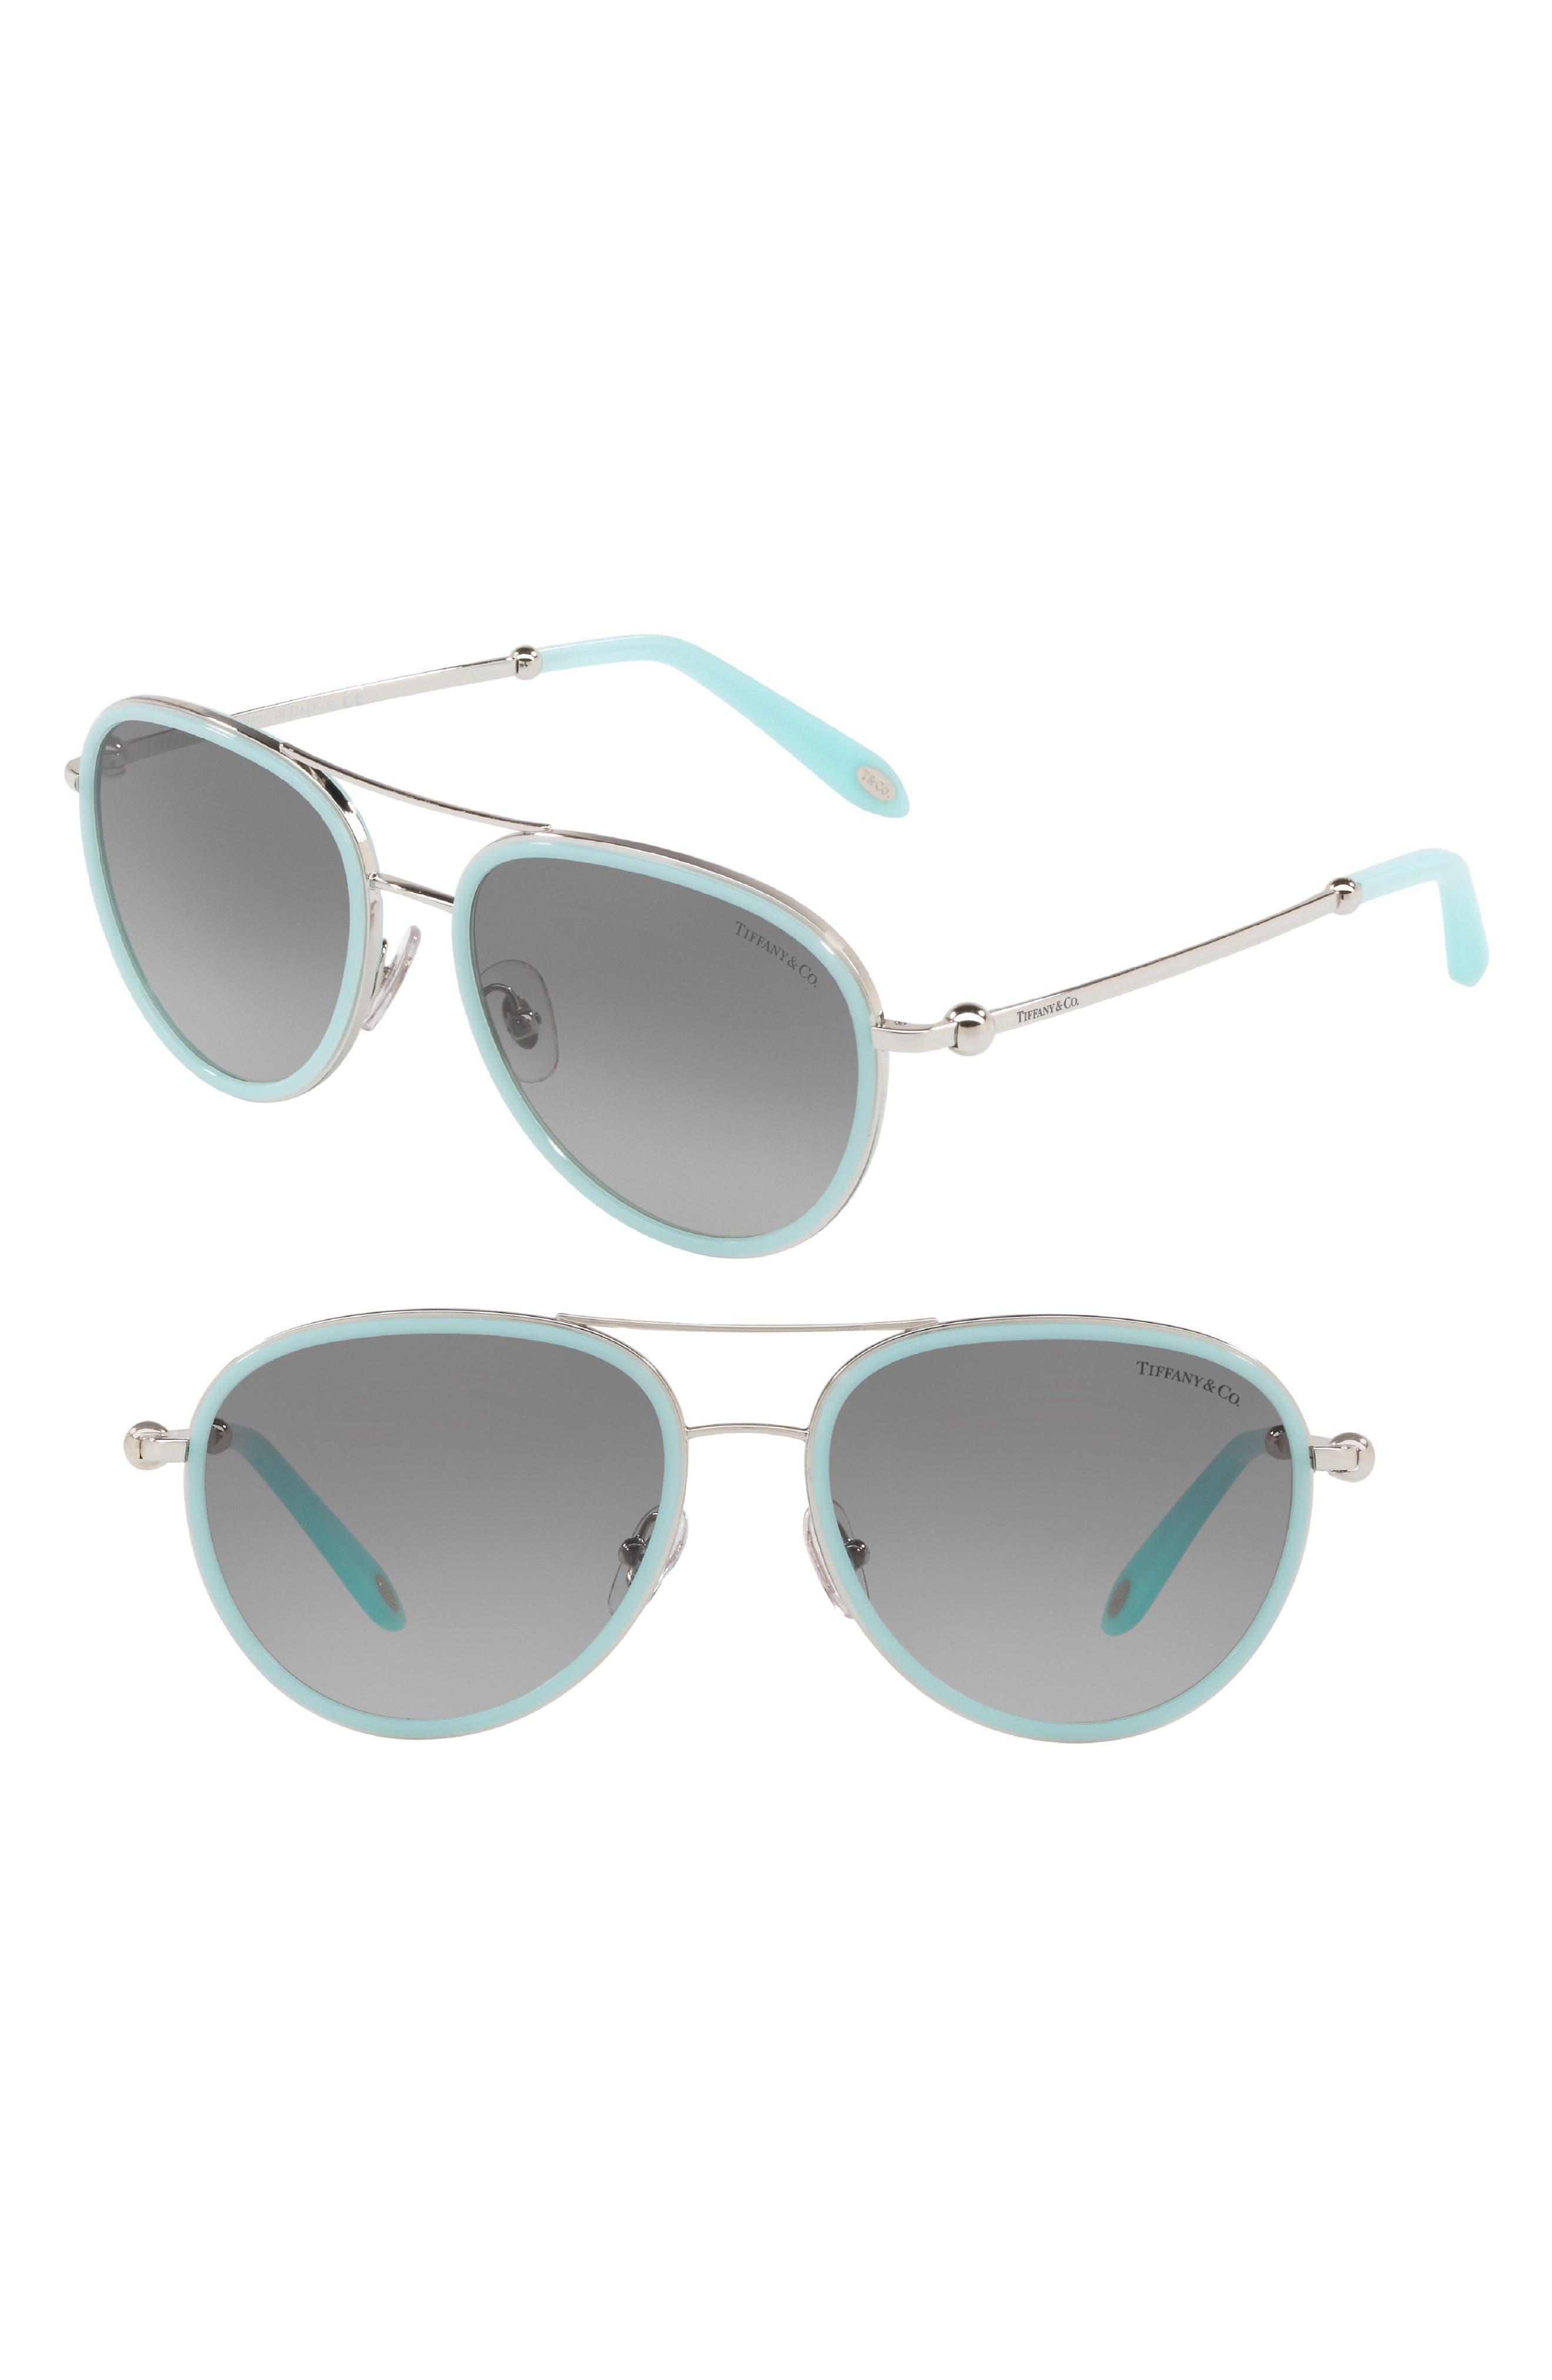 55mm Gradient Aviator Sunglasses,                             Main thumbnail 1, color,                             BLUE GRADIENT